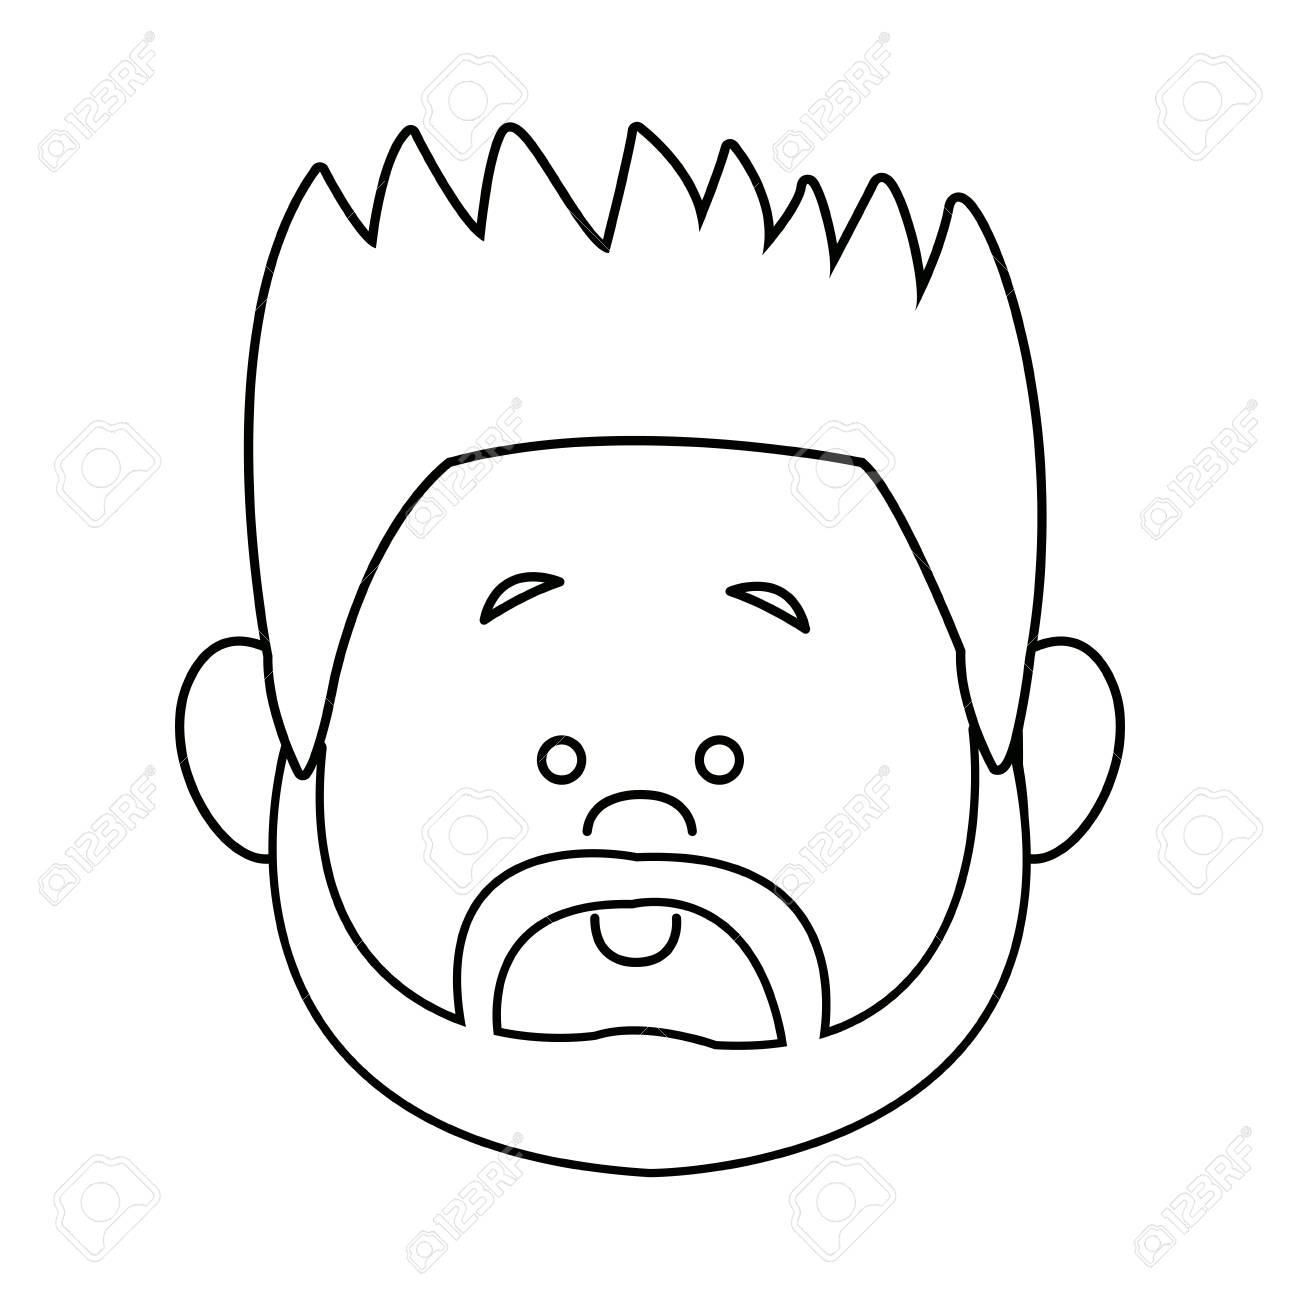 profile man face character person head cartoon vector illustration